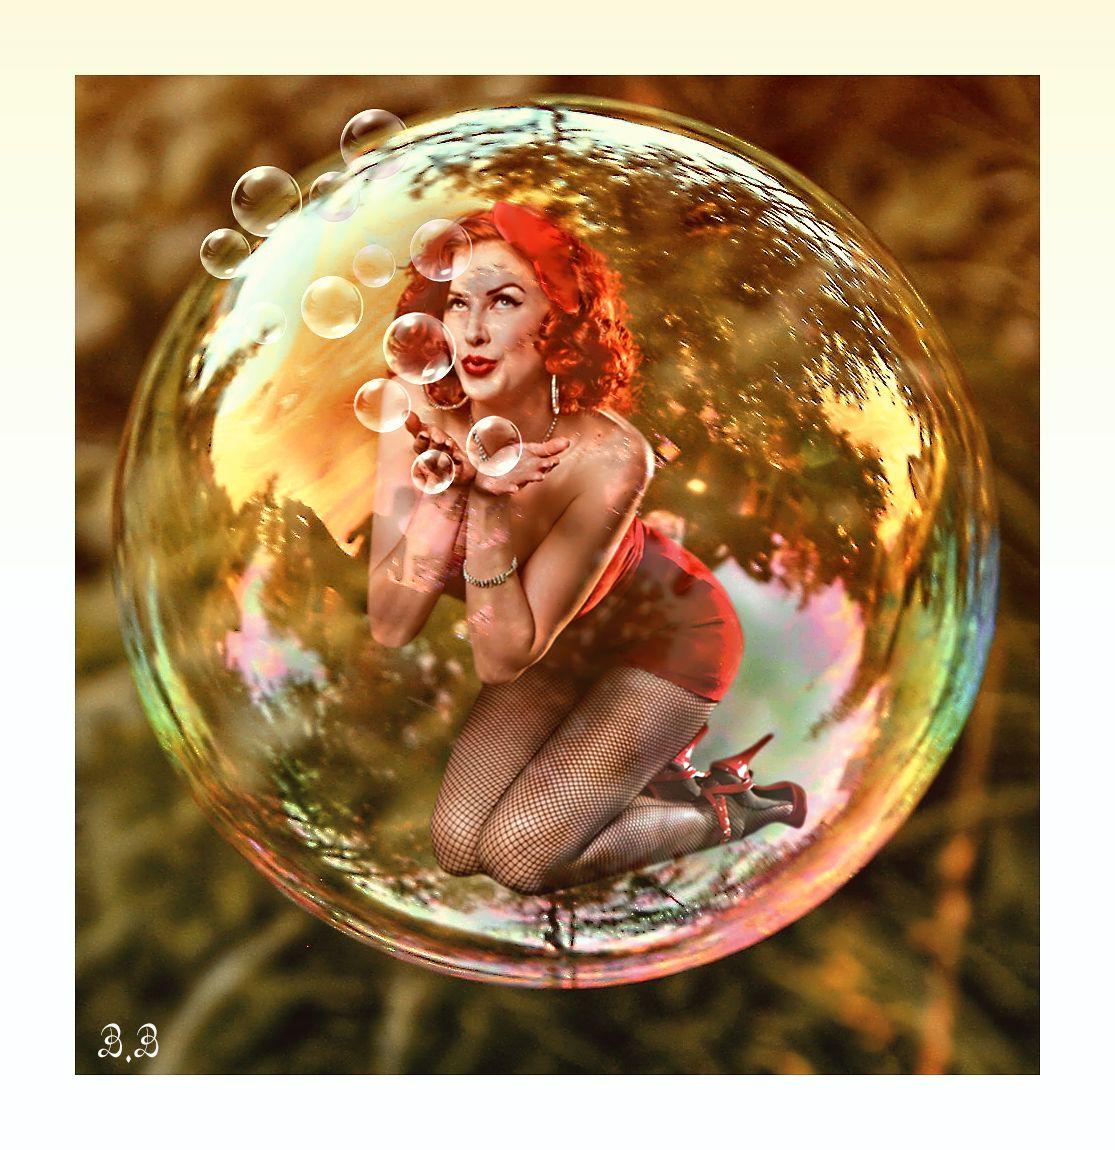 En mi burbuja.